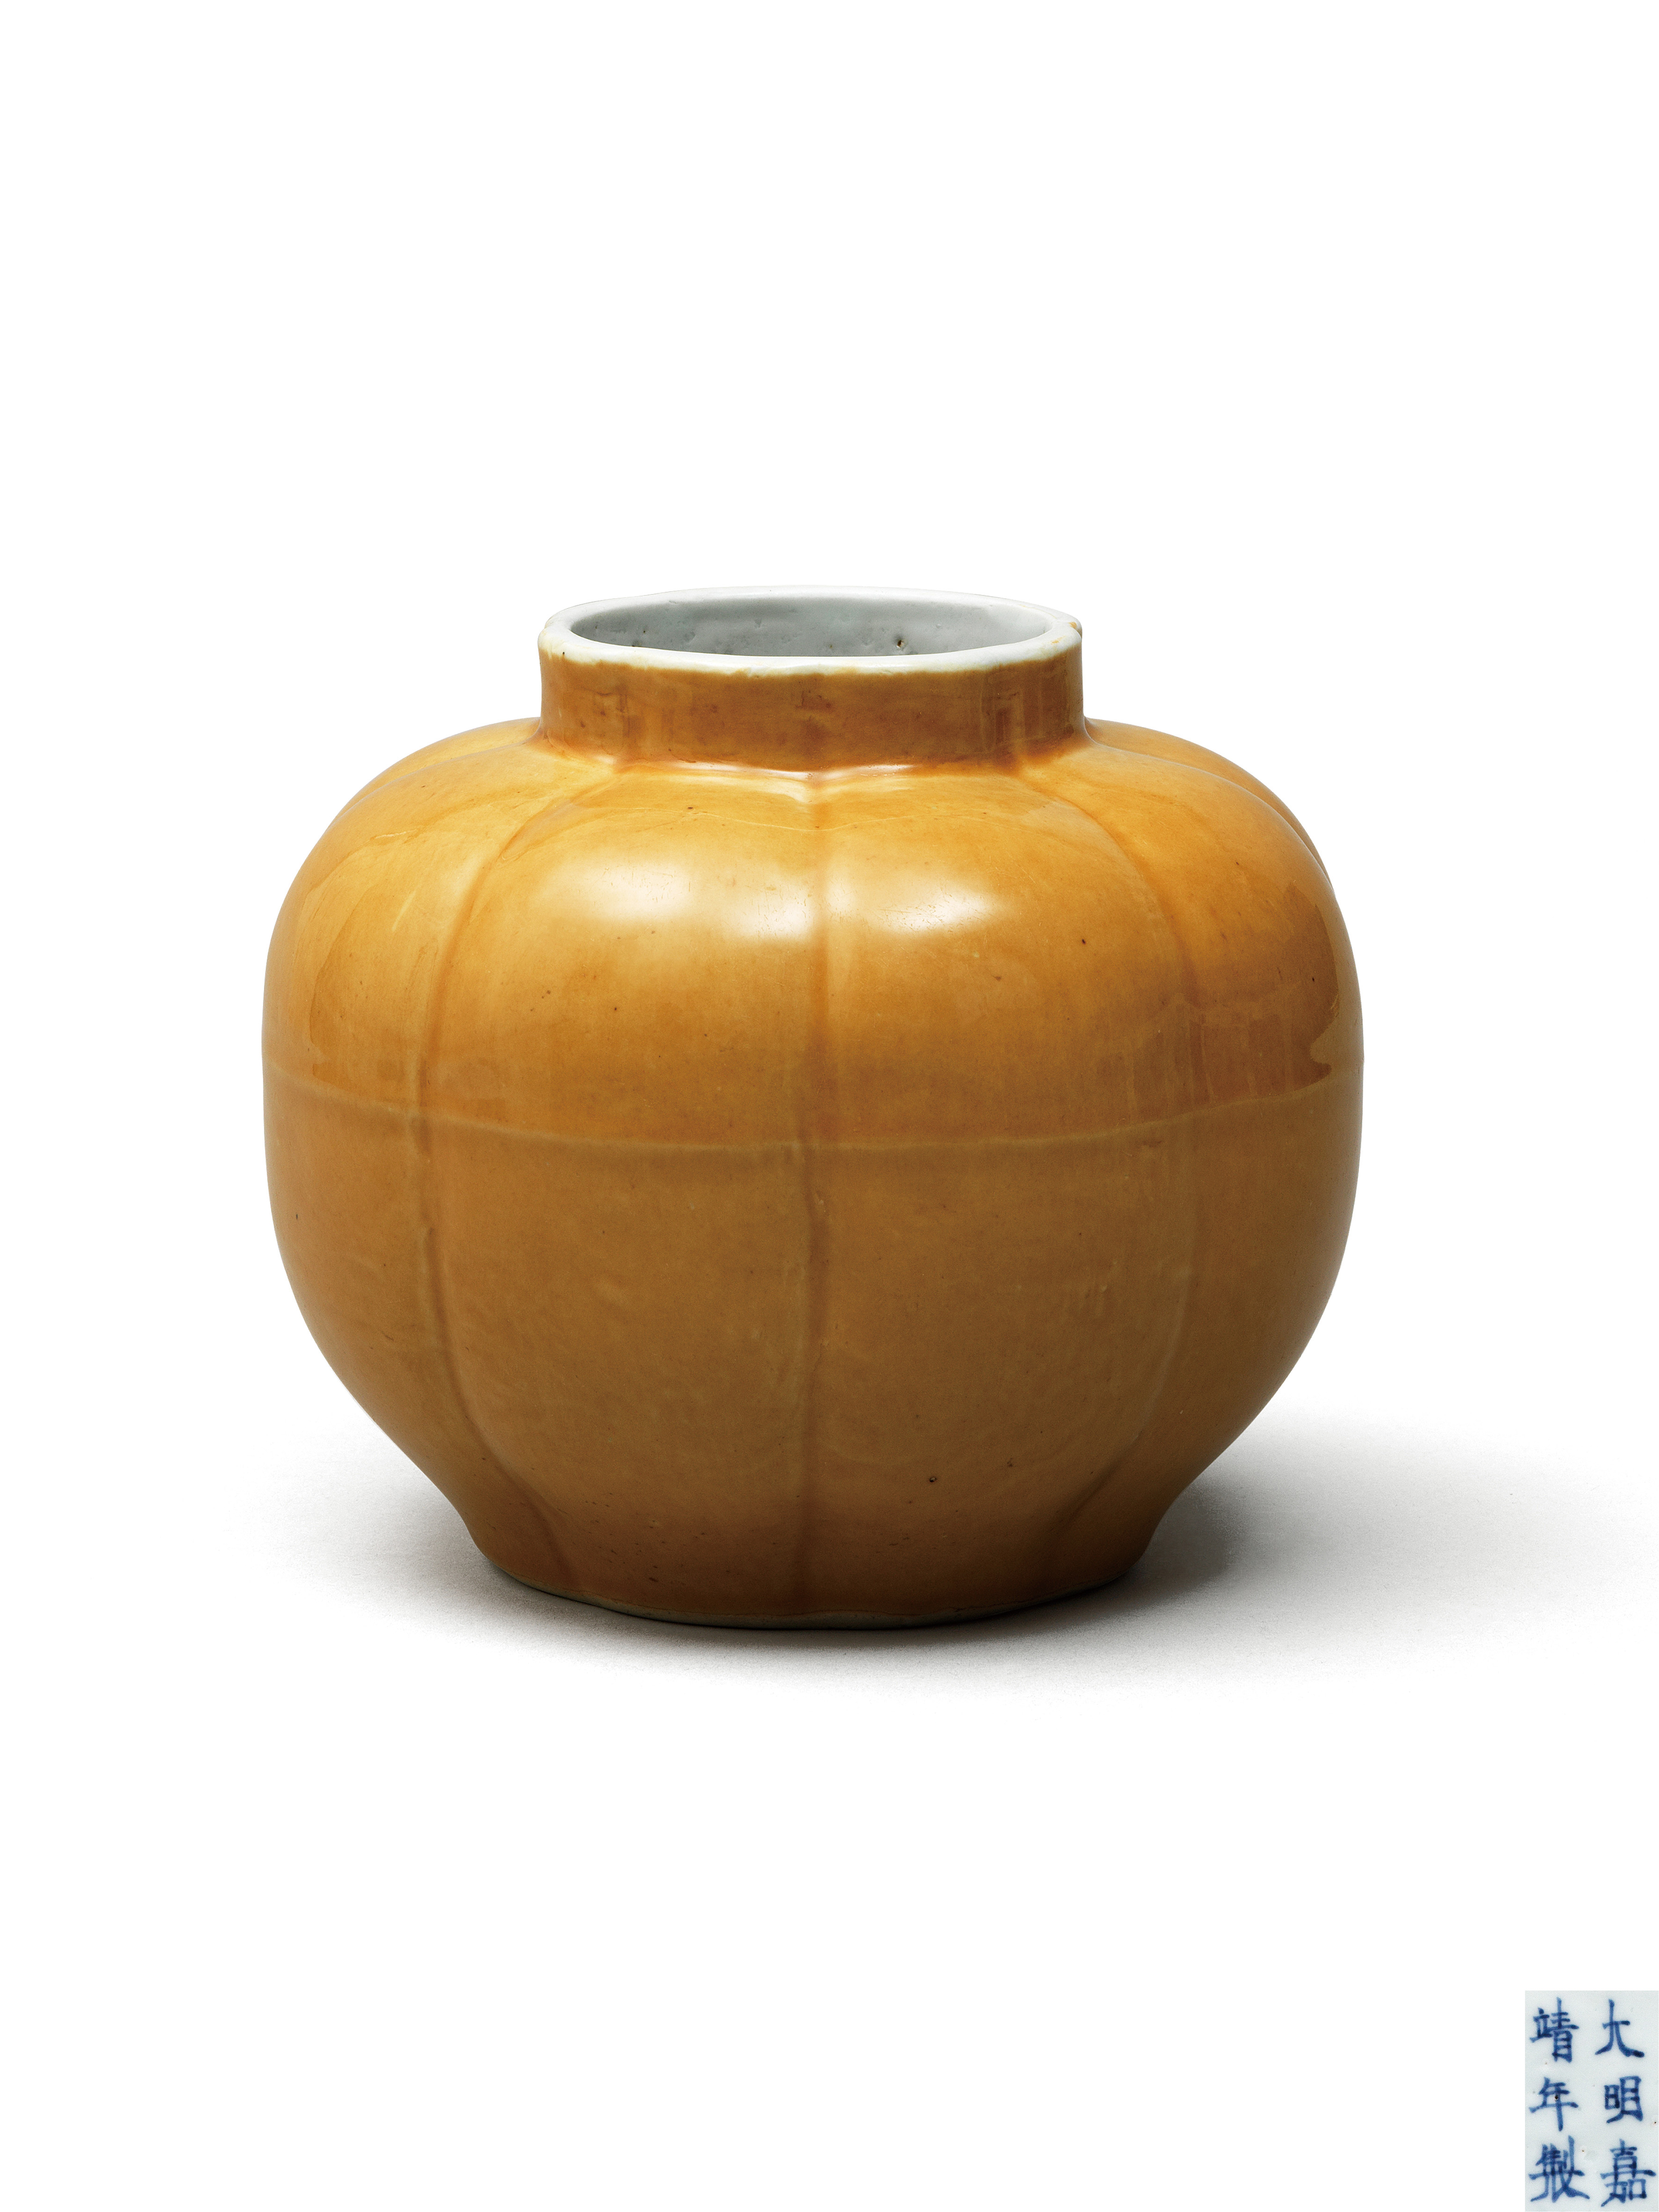 Lot 23 - A 'café-au-lait' glazed jar, Ming Dynasty, Jiajing six-character mark and of the period